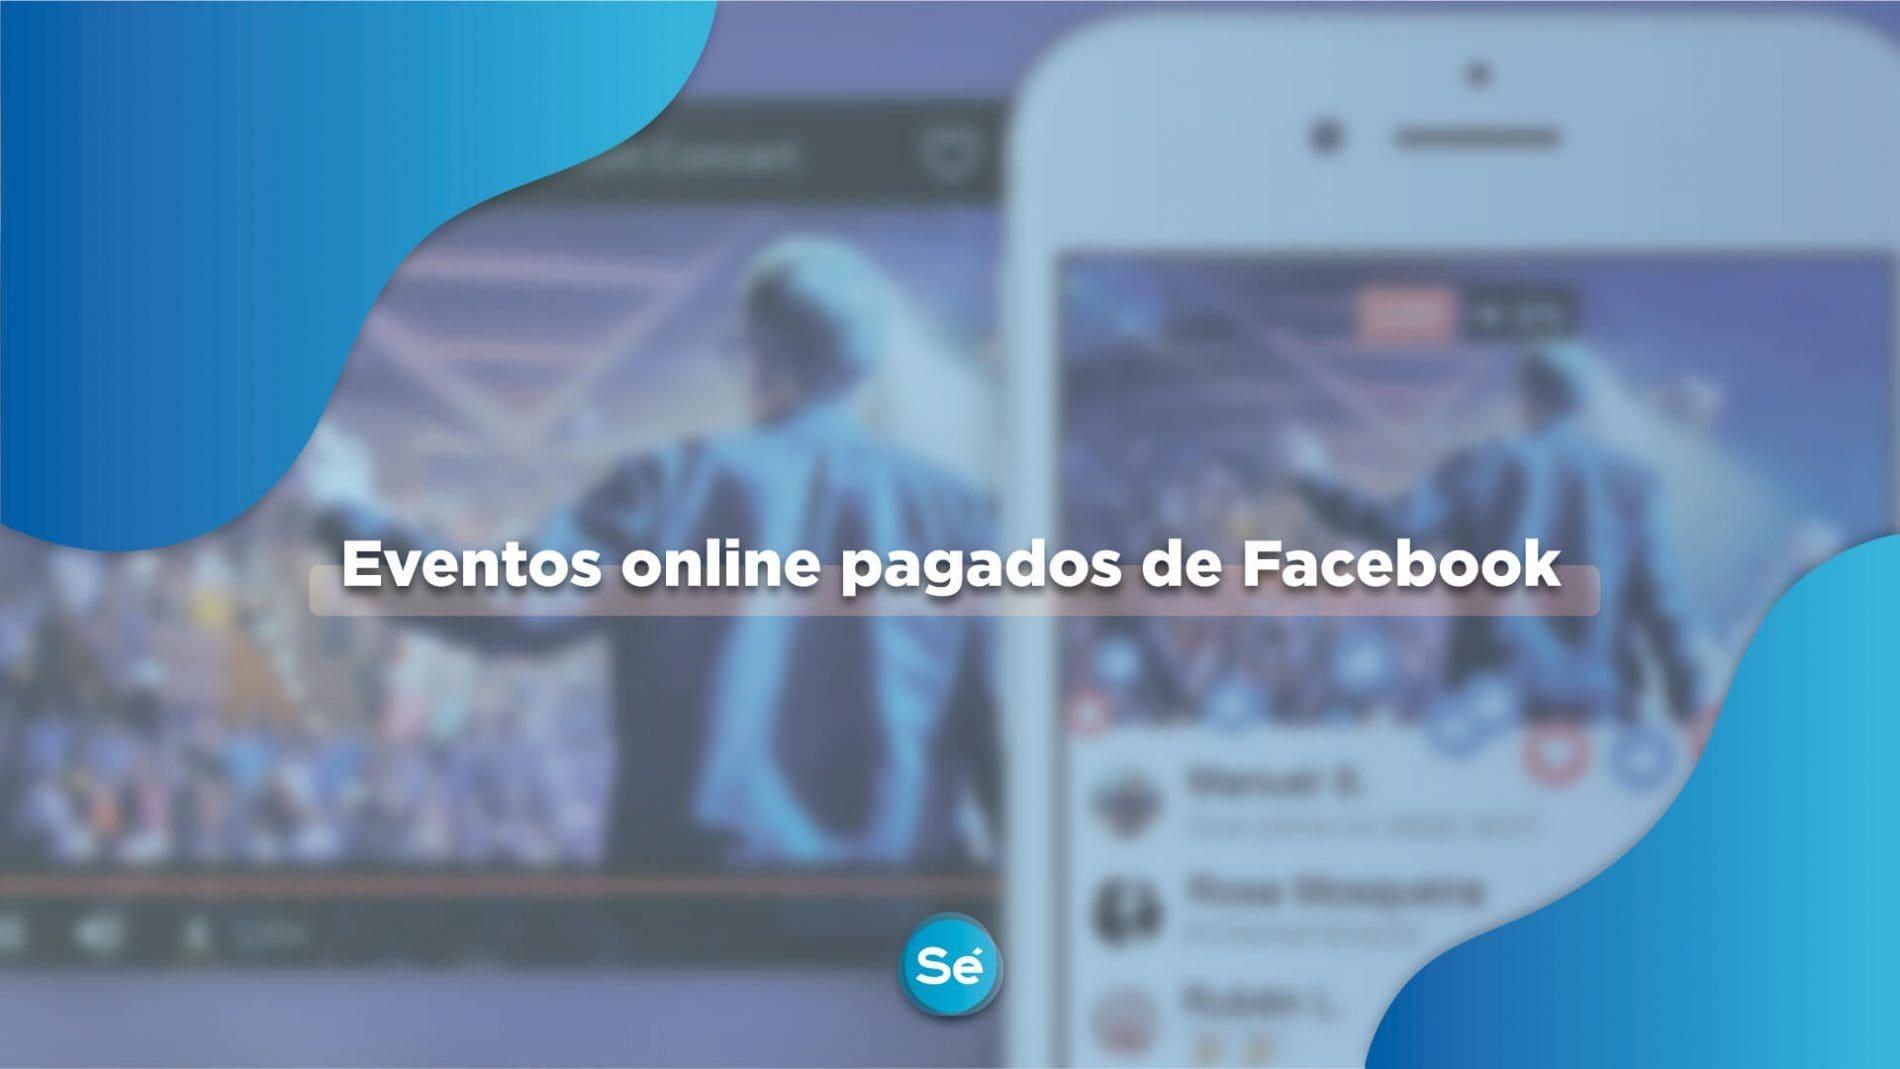 Eventos online pagados de Facebook